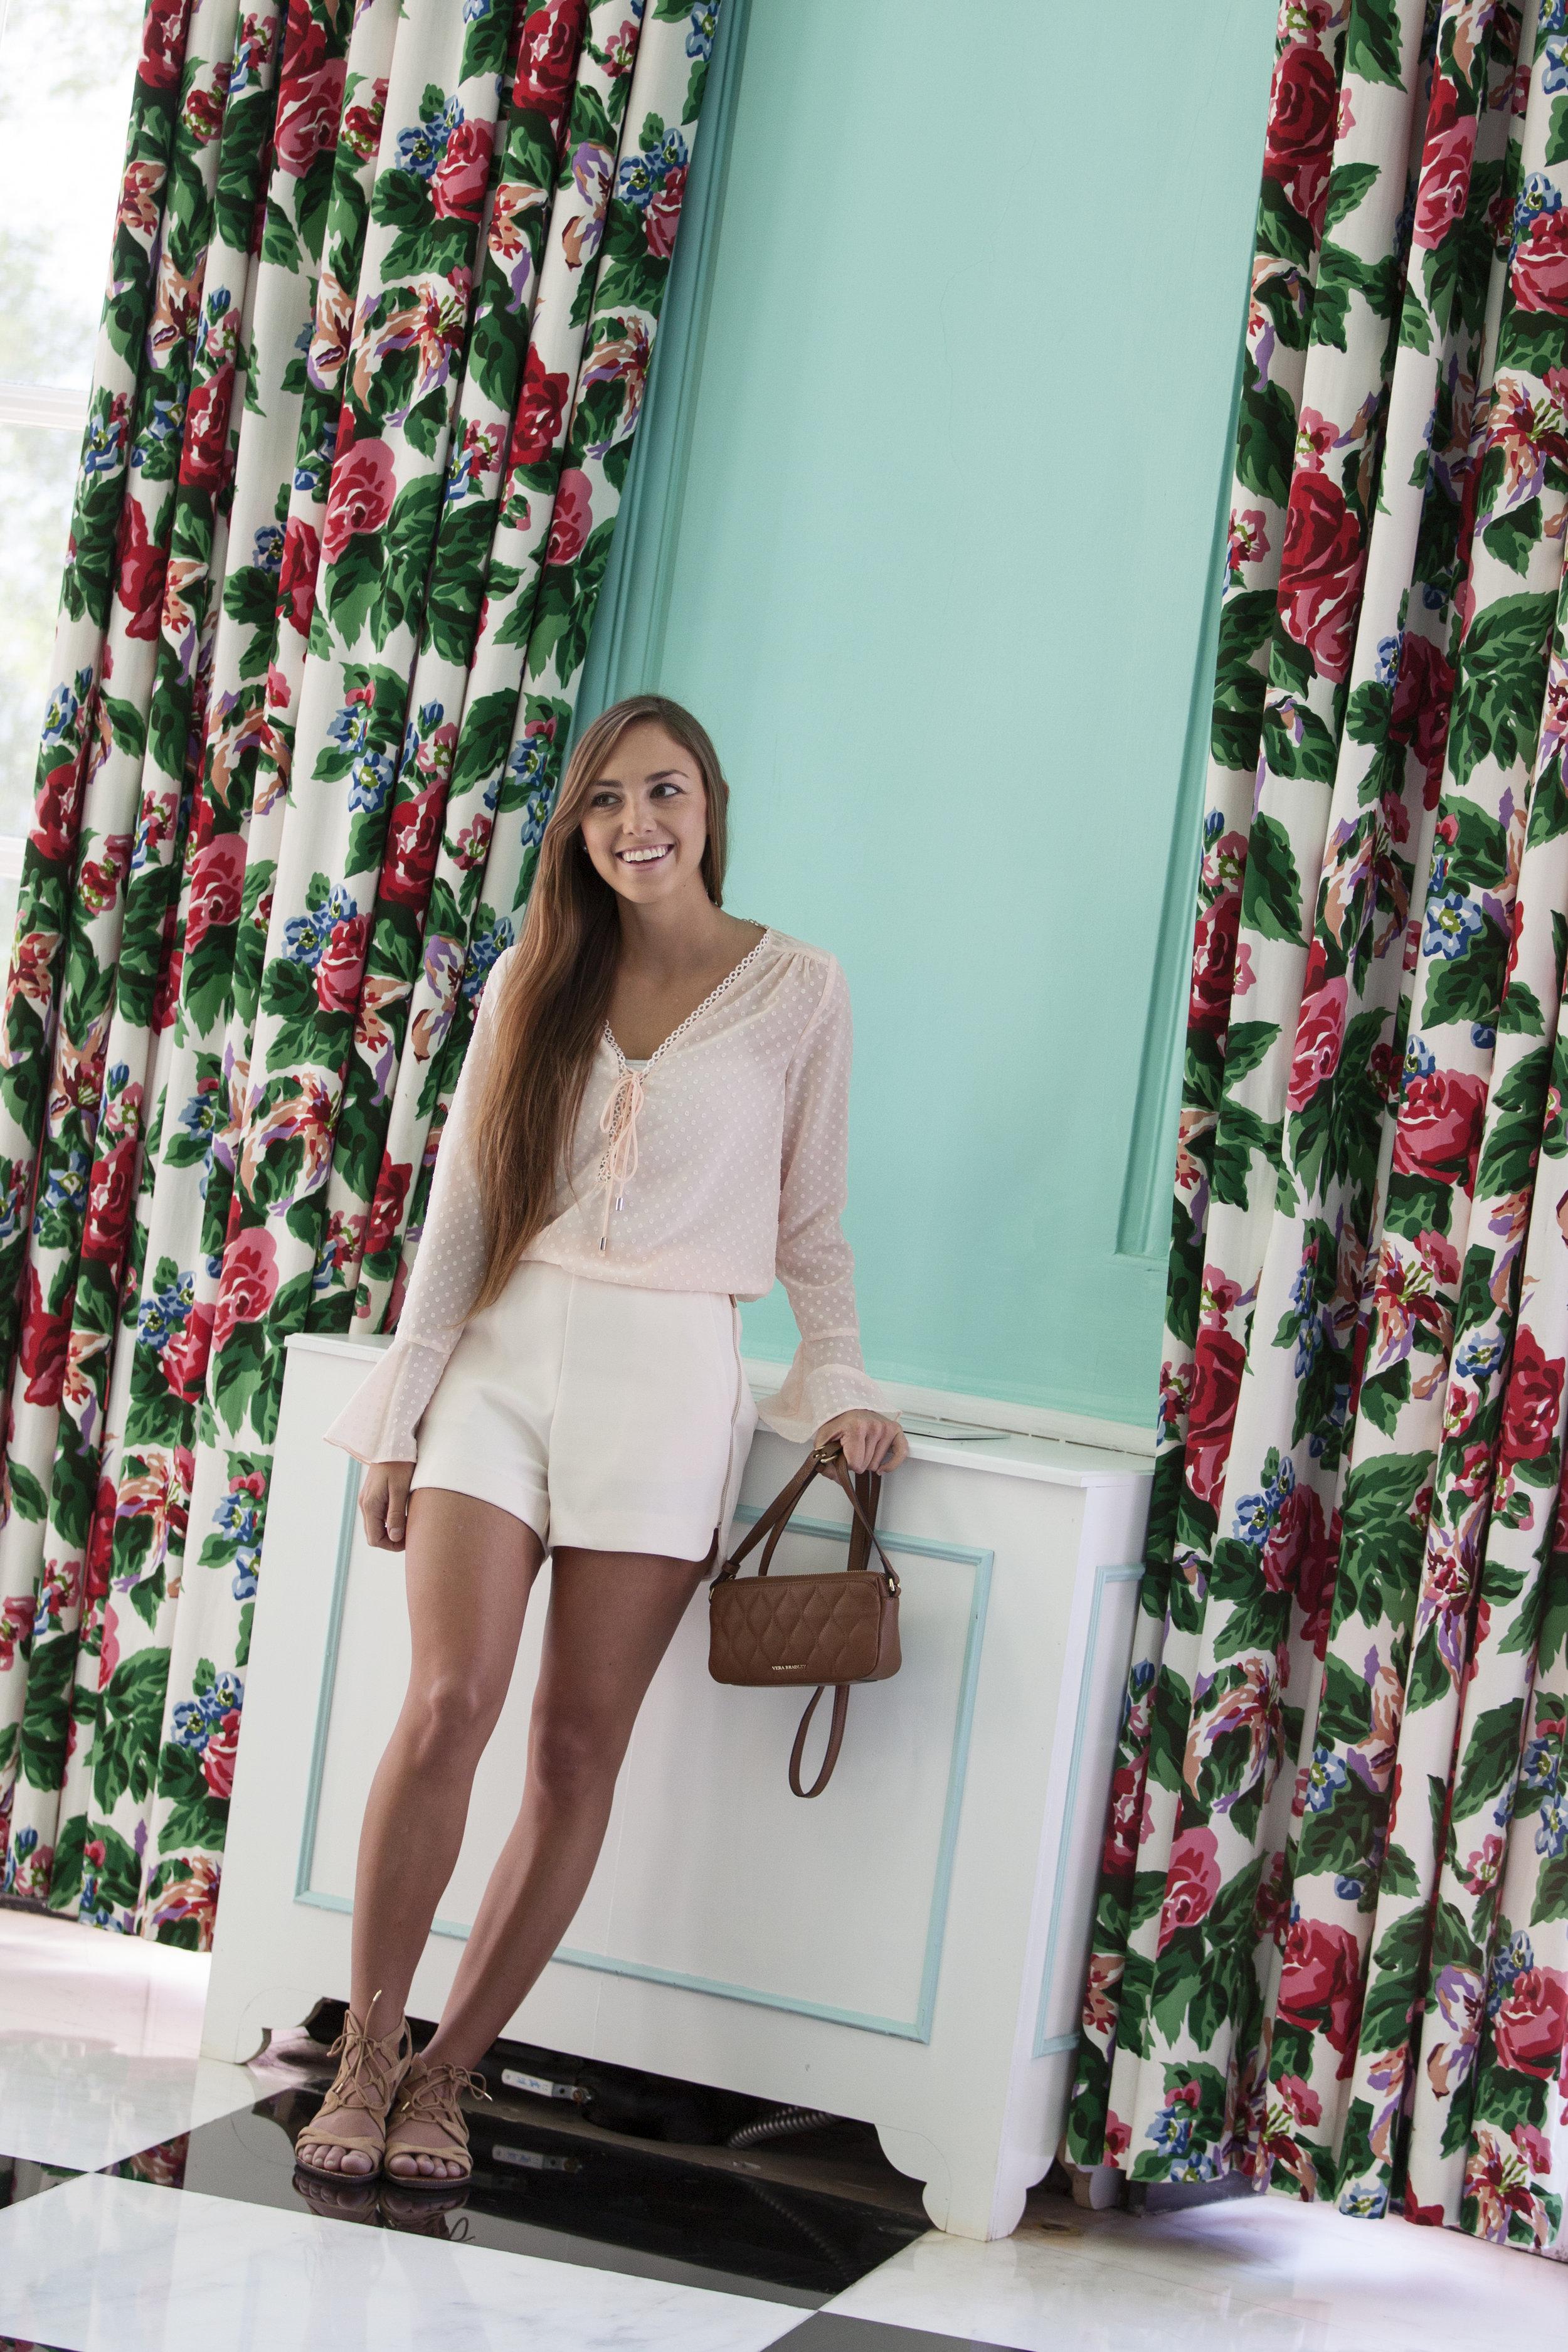 Clothing:  Lucy Paris Blouse -$84, Lucy Paris Shorts - $84 -  Belle & Beau  Accessories:  Quilted Sydney Bag by Vera Bradley- $148 -  Crepe Myrtle Bags & Beads   Shoes : Sam Edelman - $100  - Yarid's